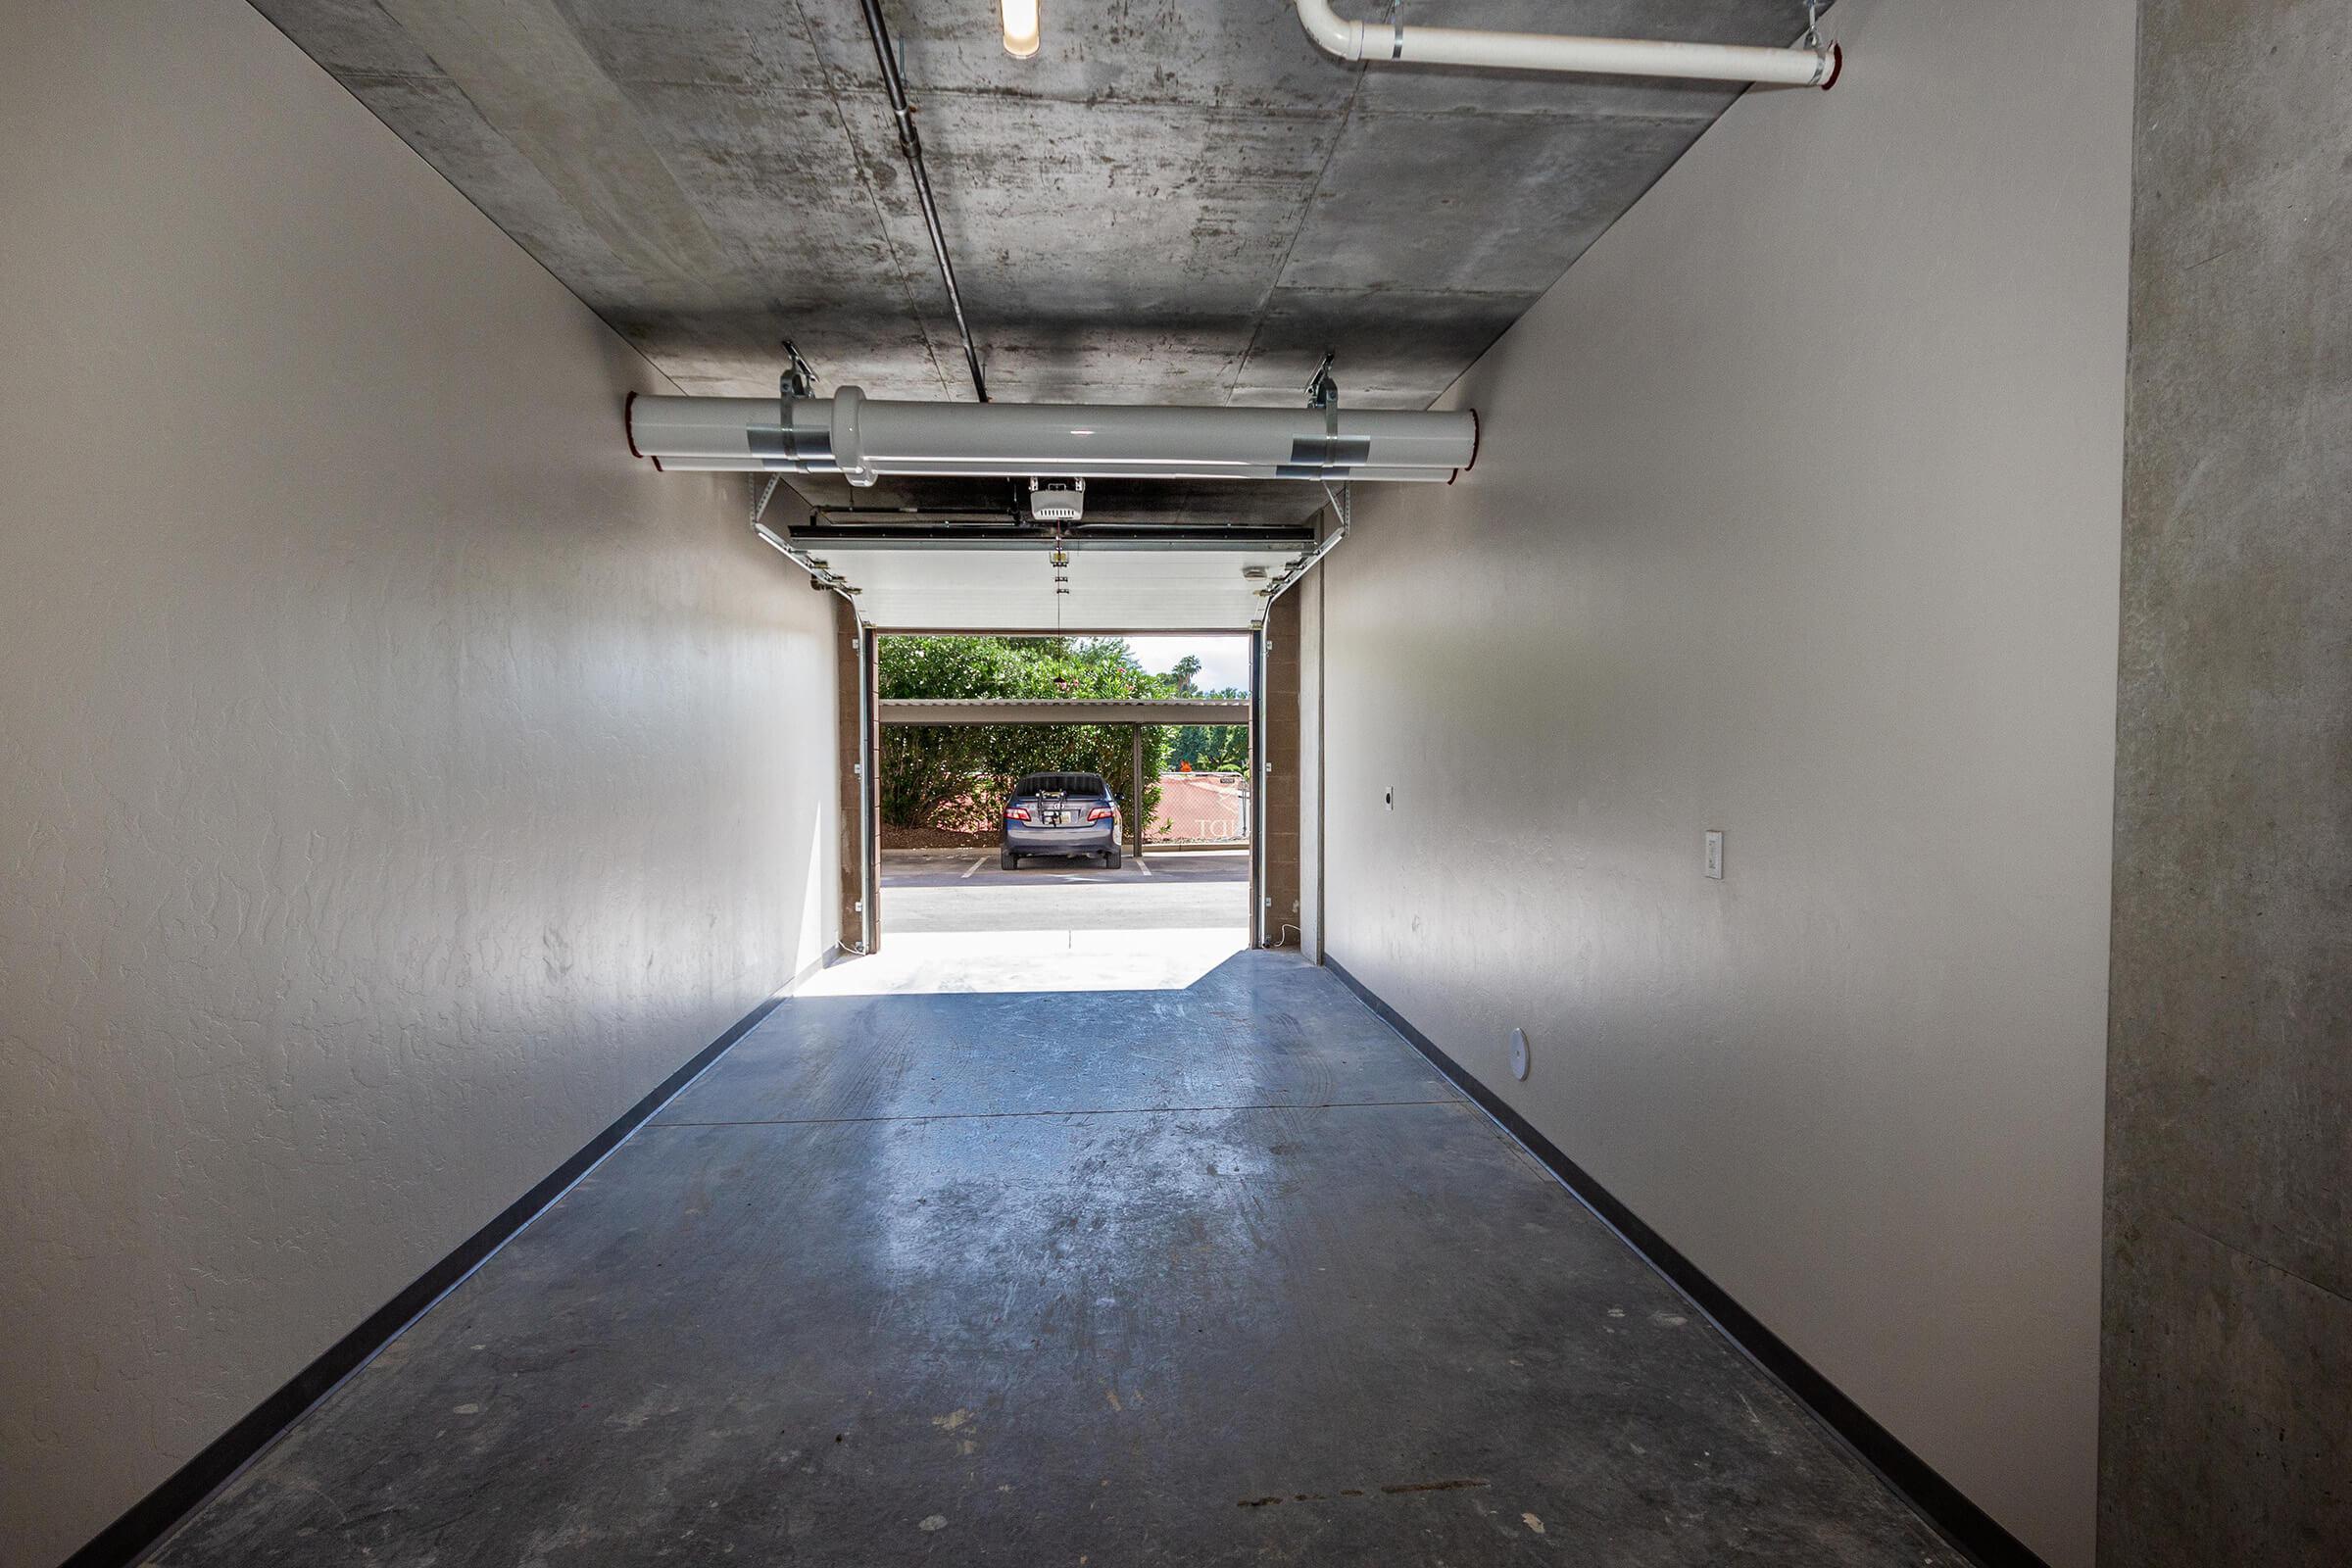 Garage Interior Looking Out.jpg